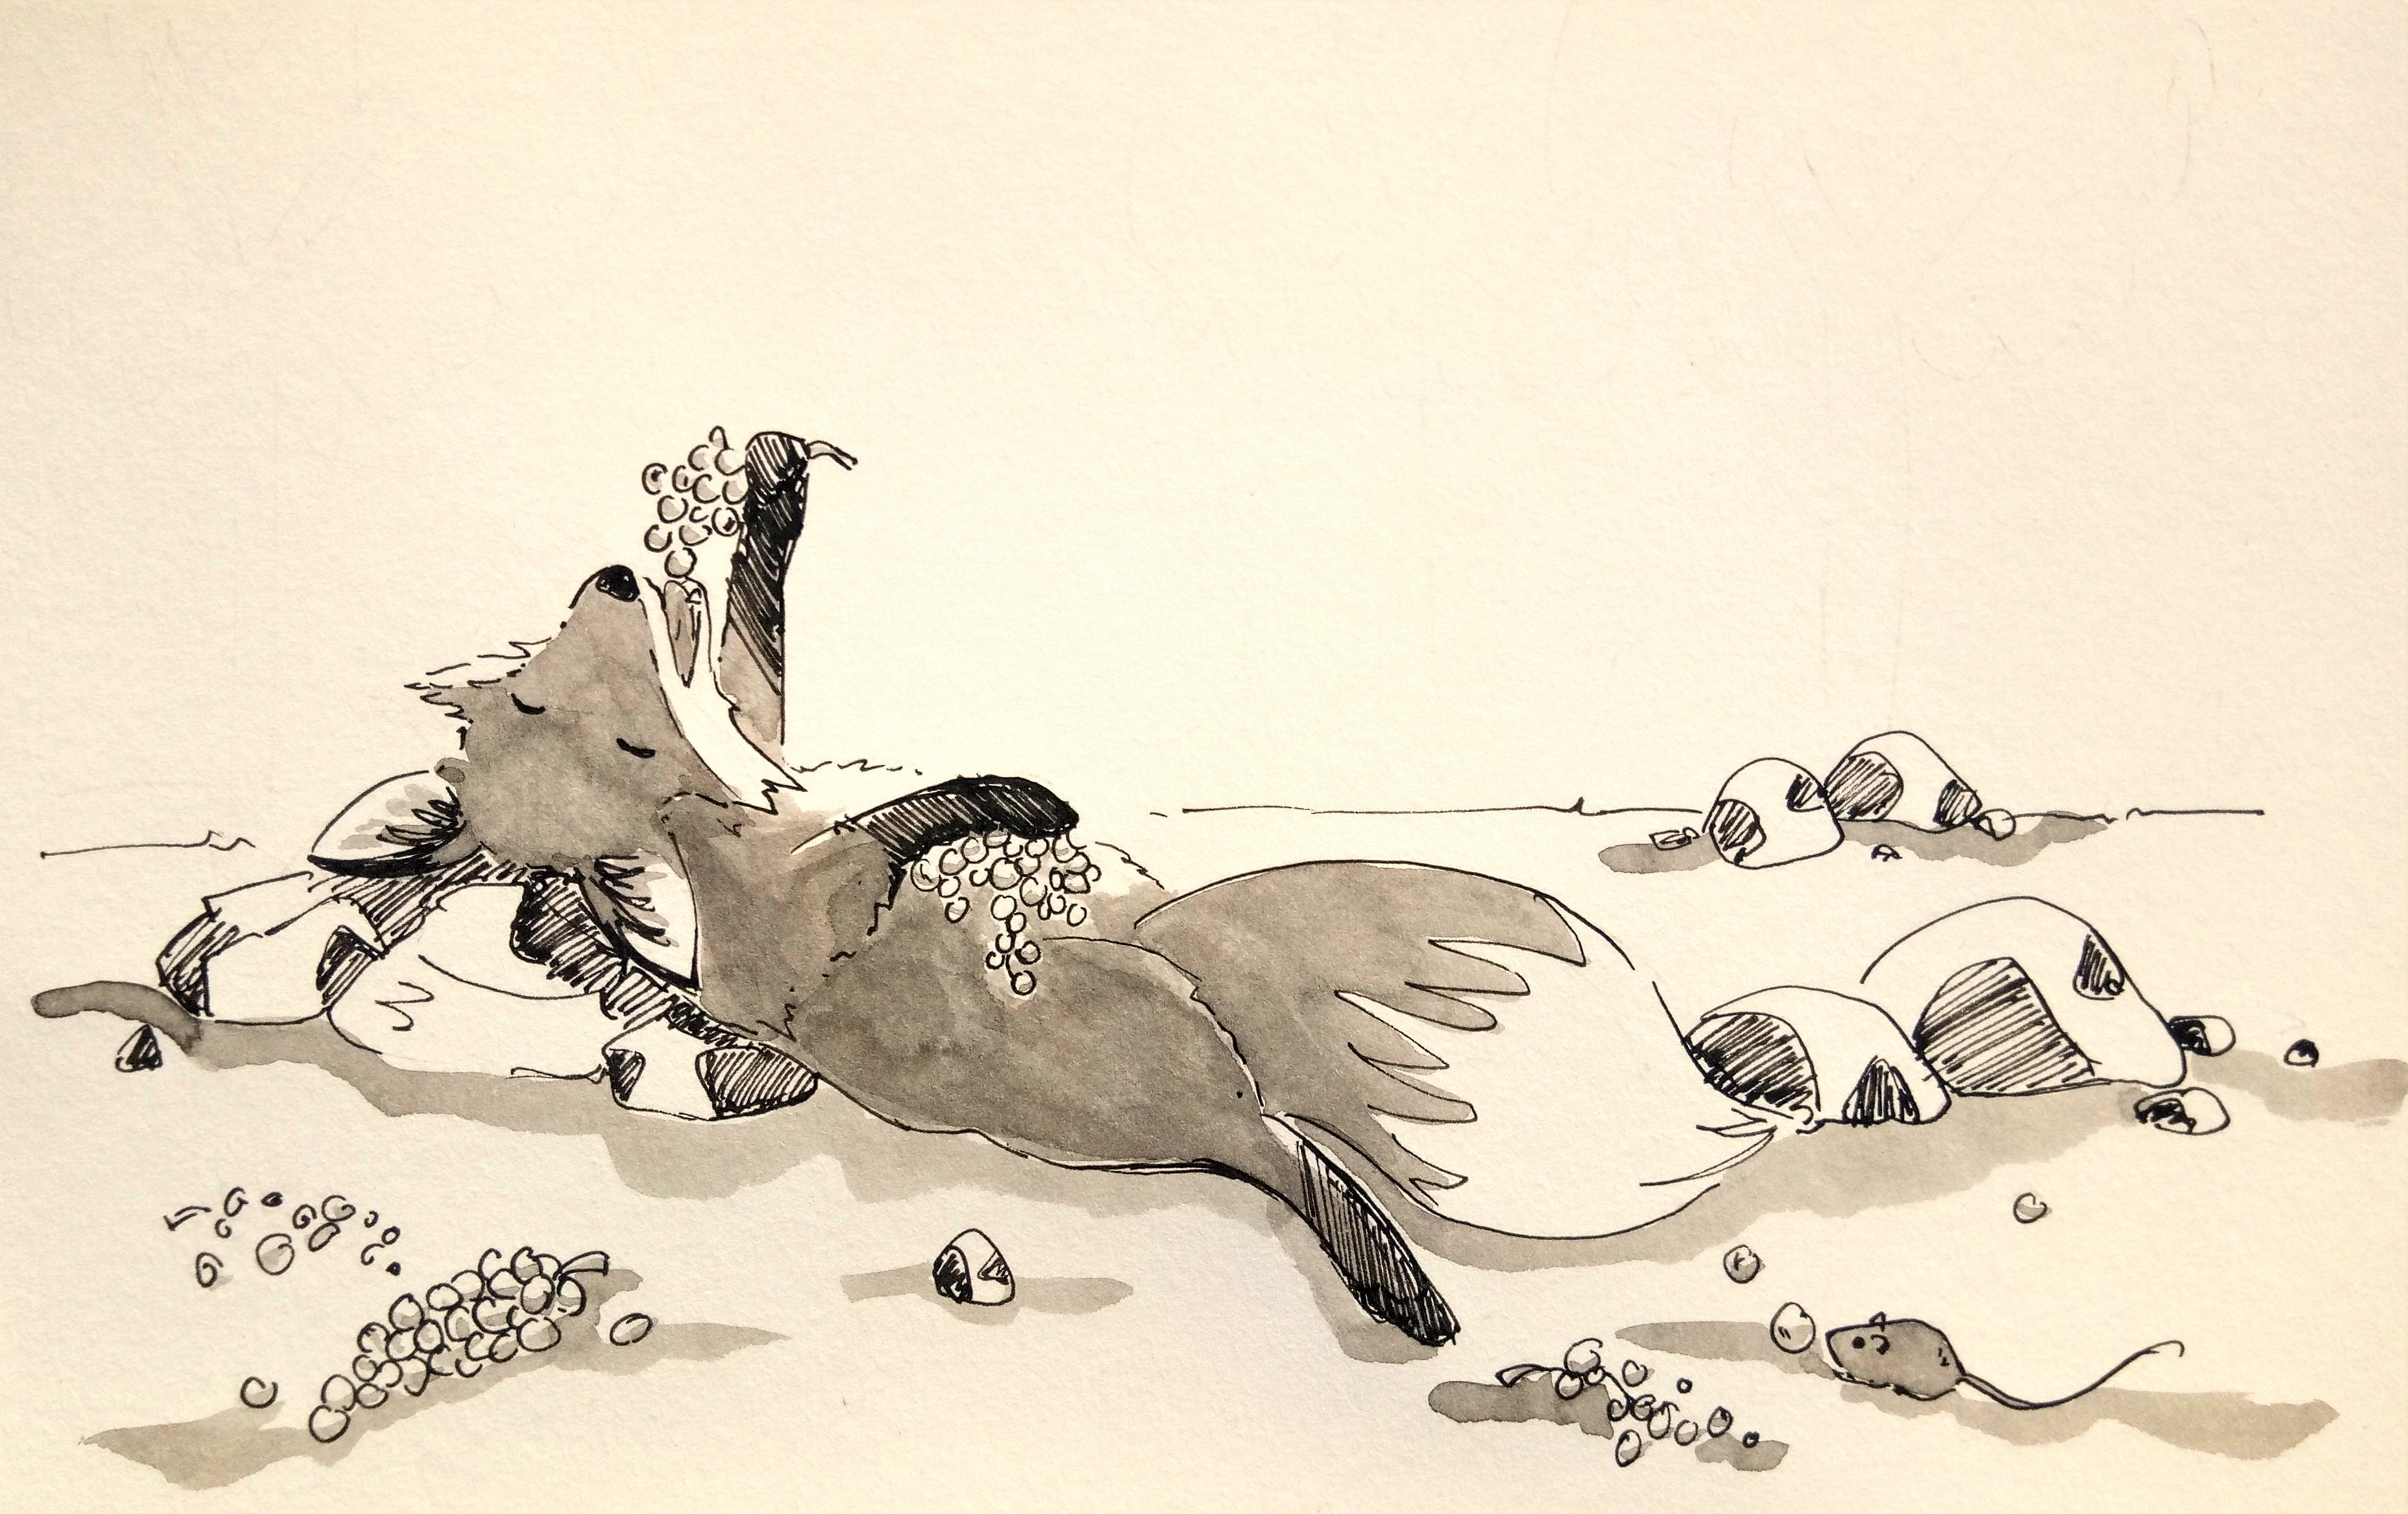 191031 Inktober_Ripe_Melanie Franz